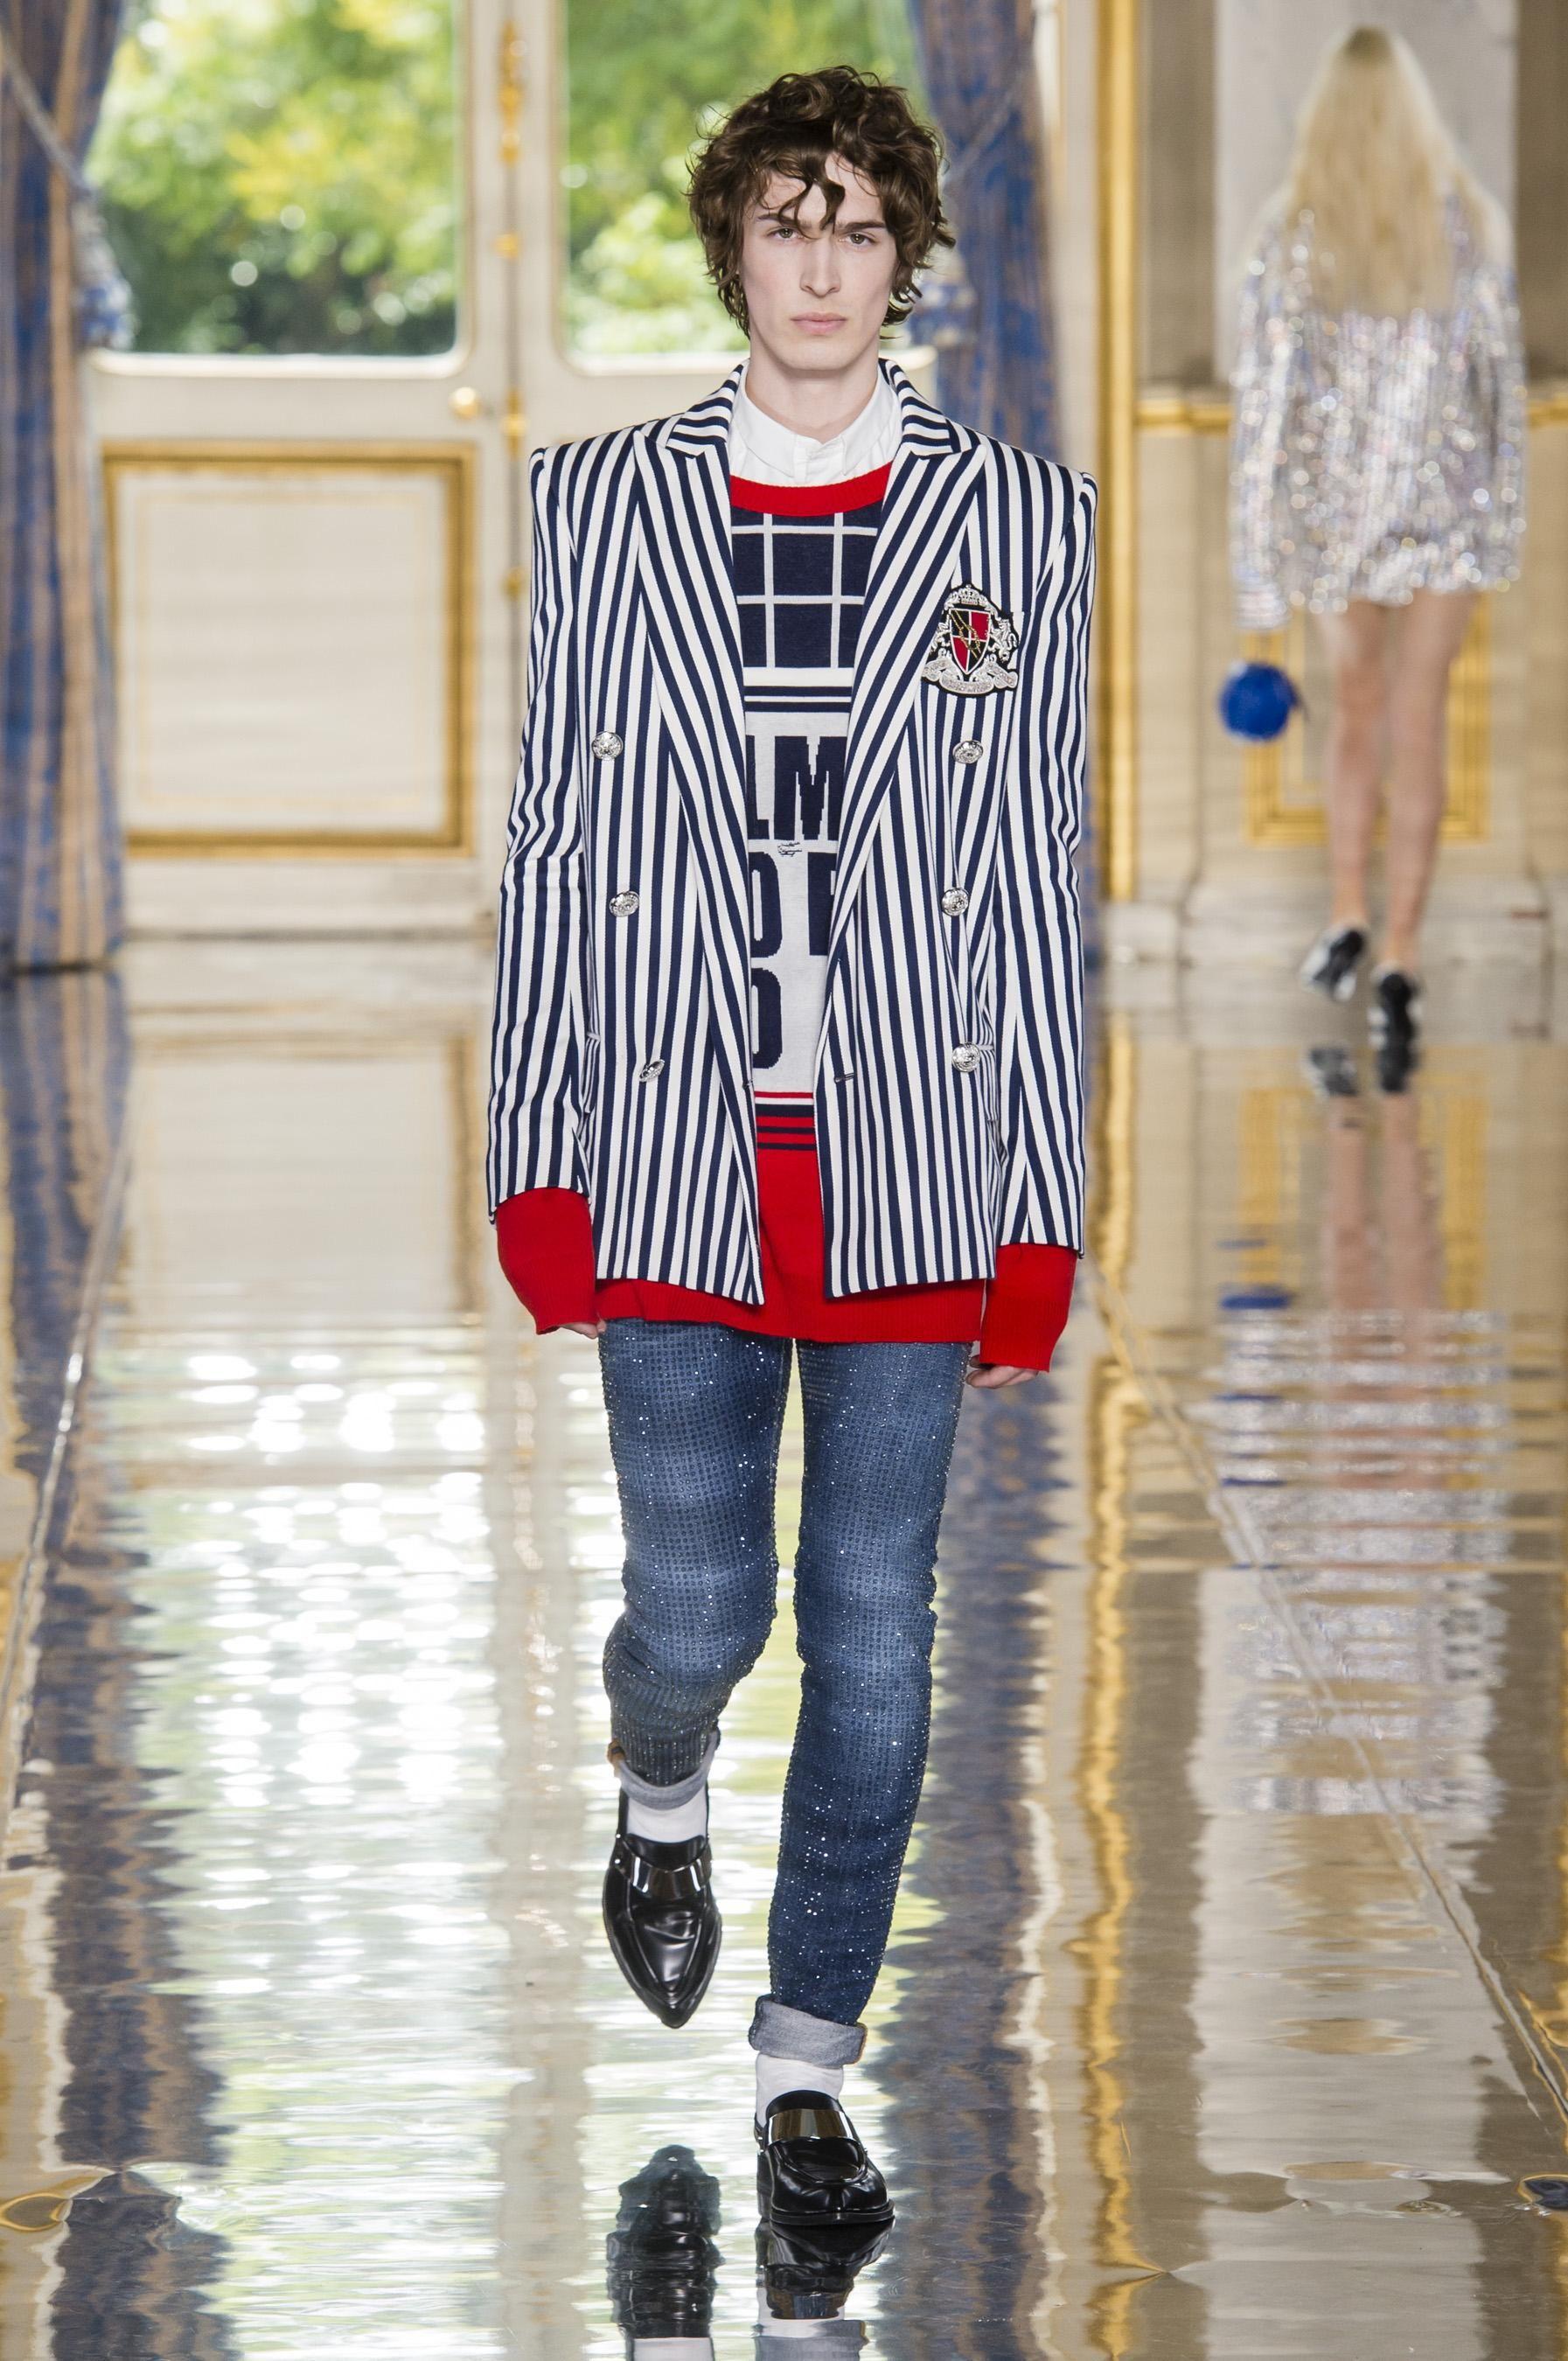 82b41a444c91 Défilé Balmain printemps-été 2019 Homme - Madame Figaro